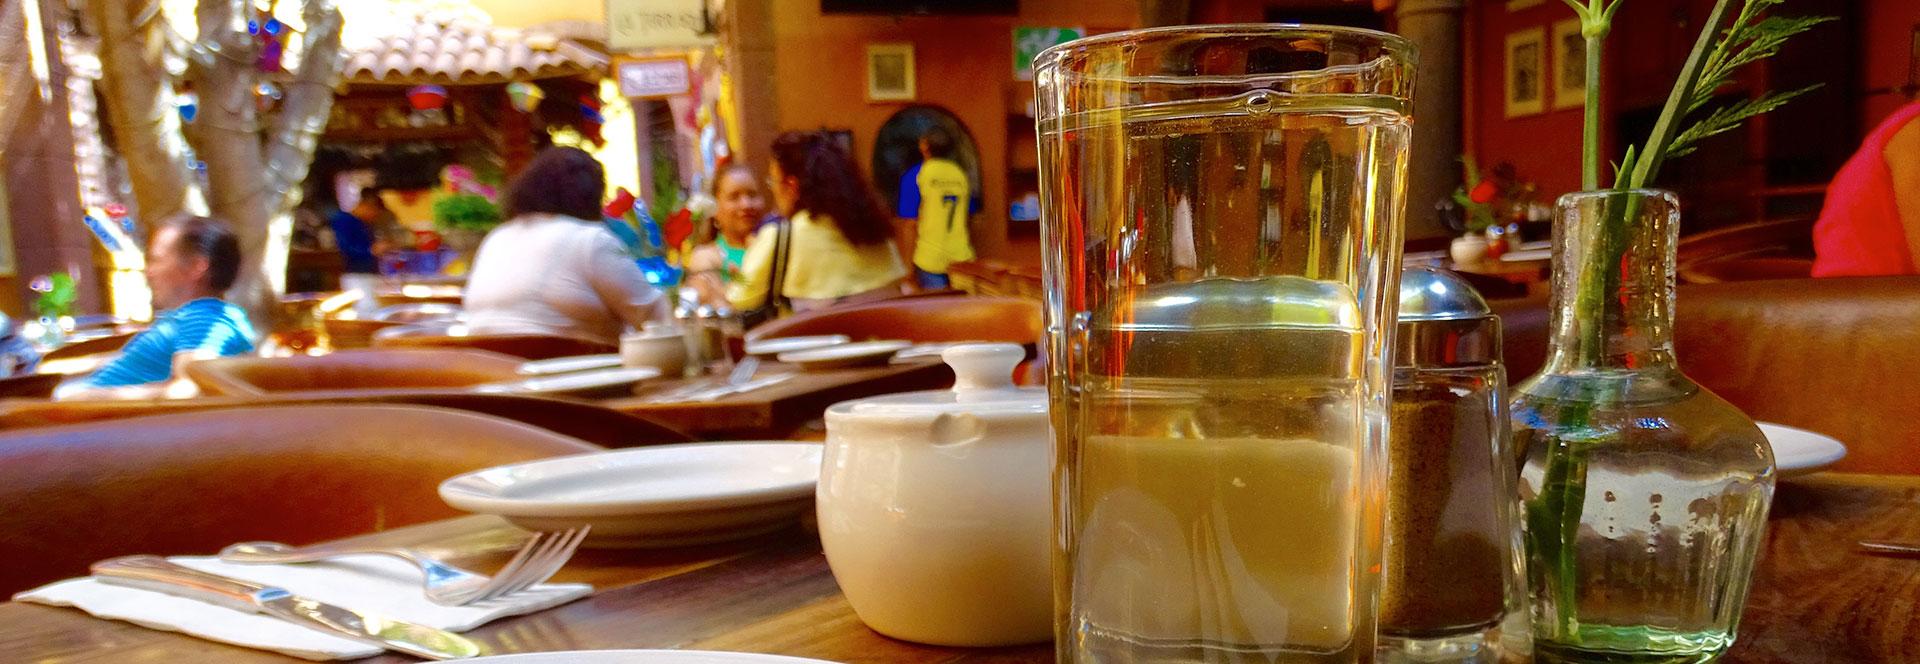 Buffet San Miguel de Allende